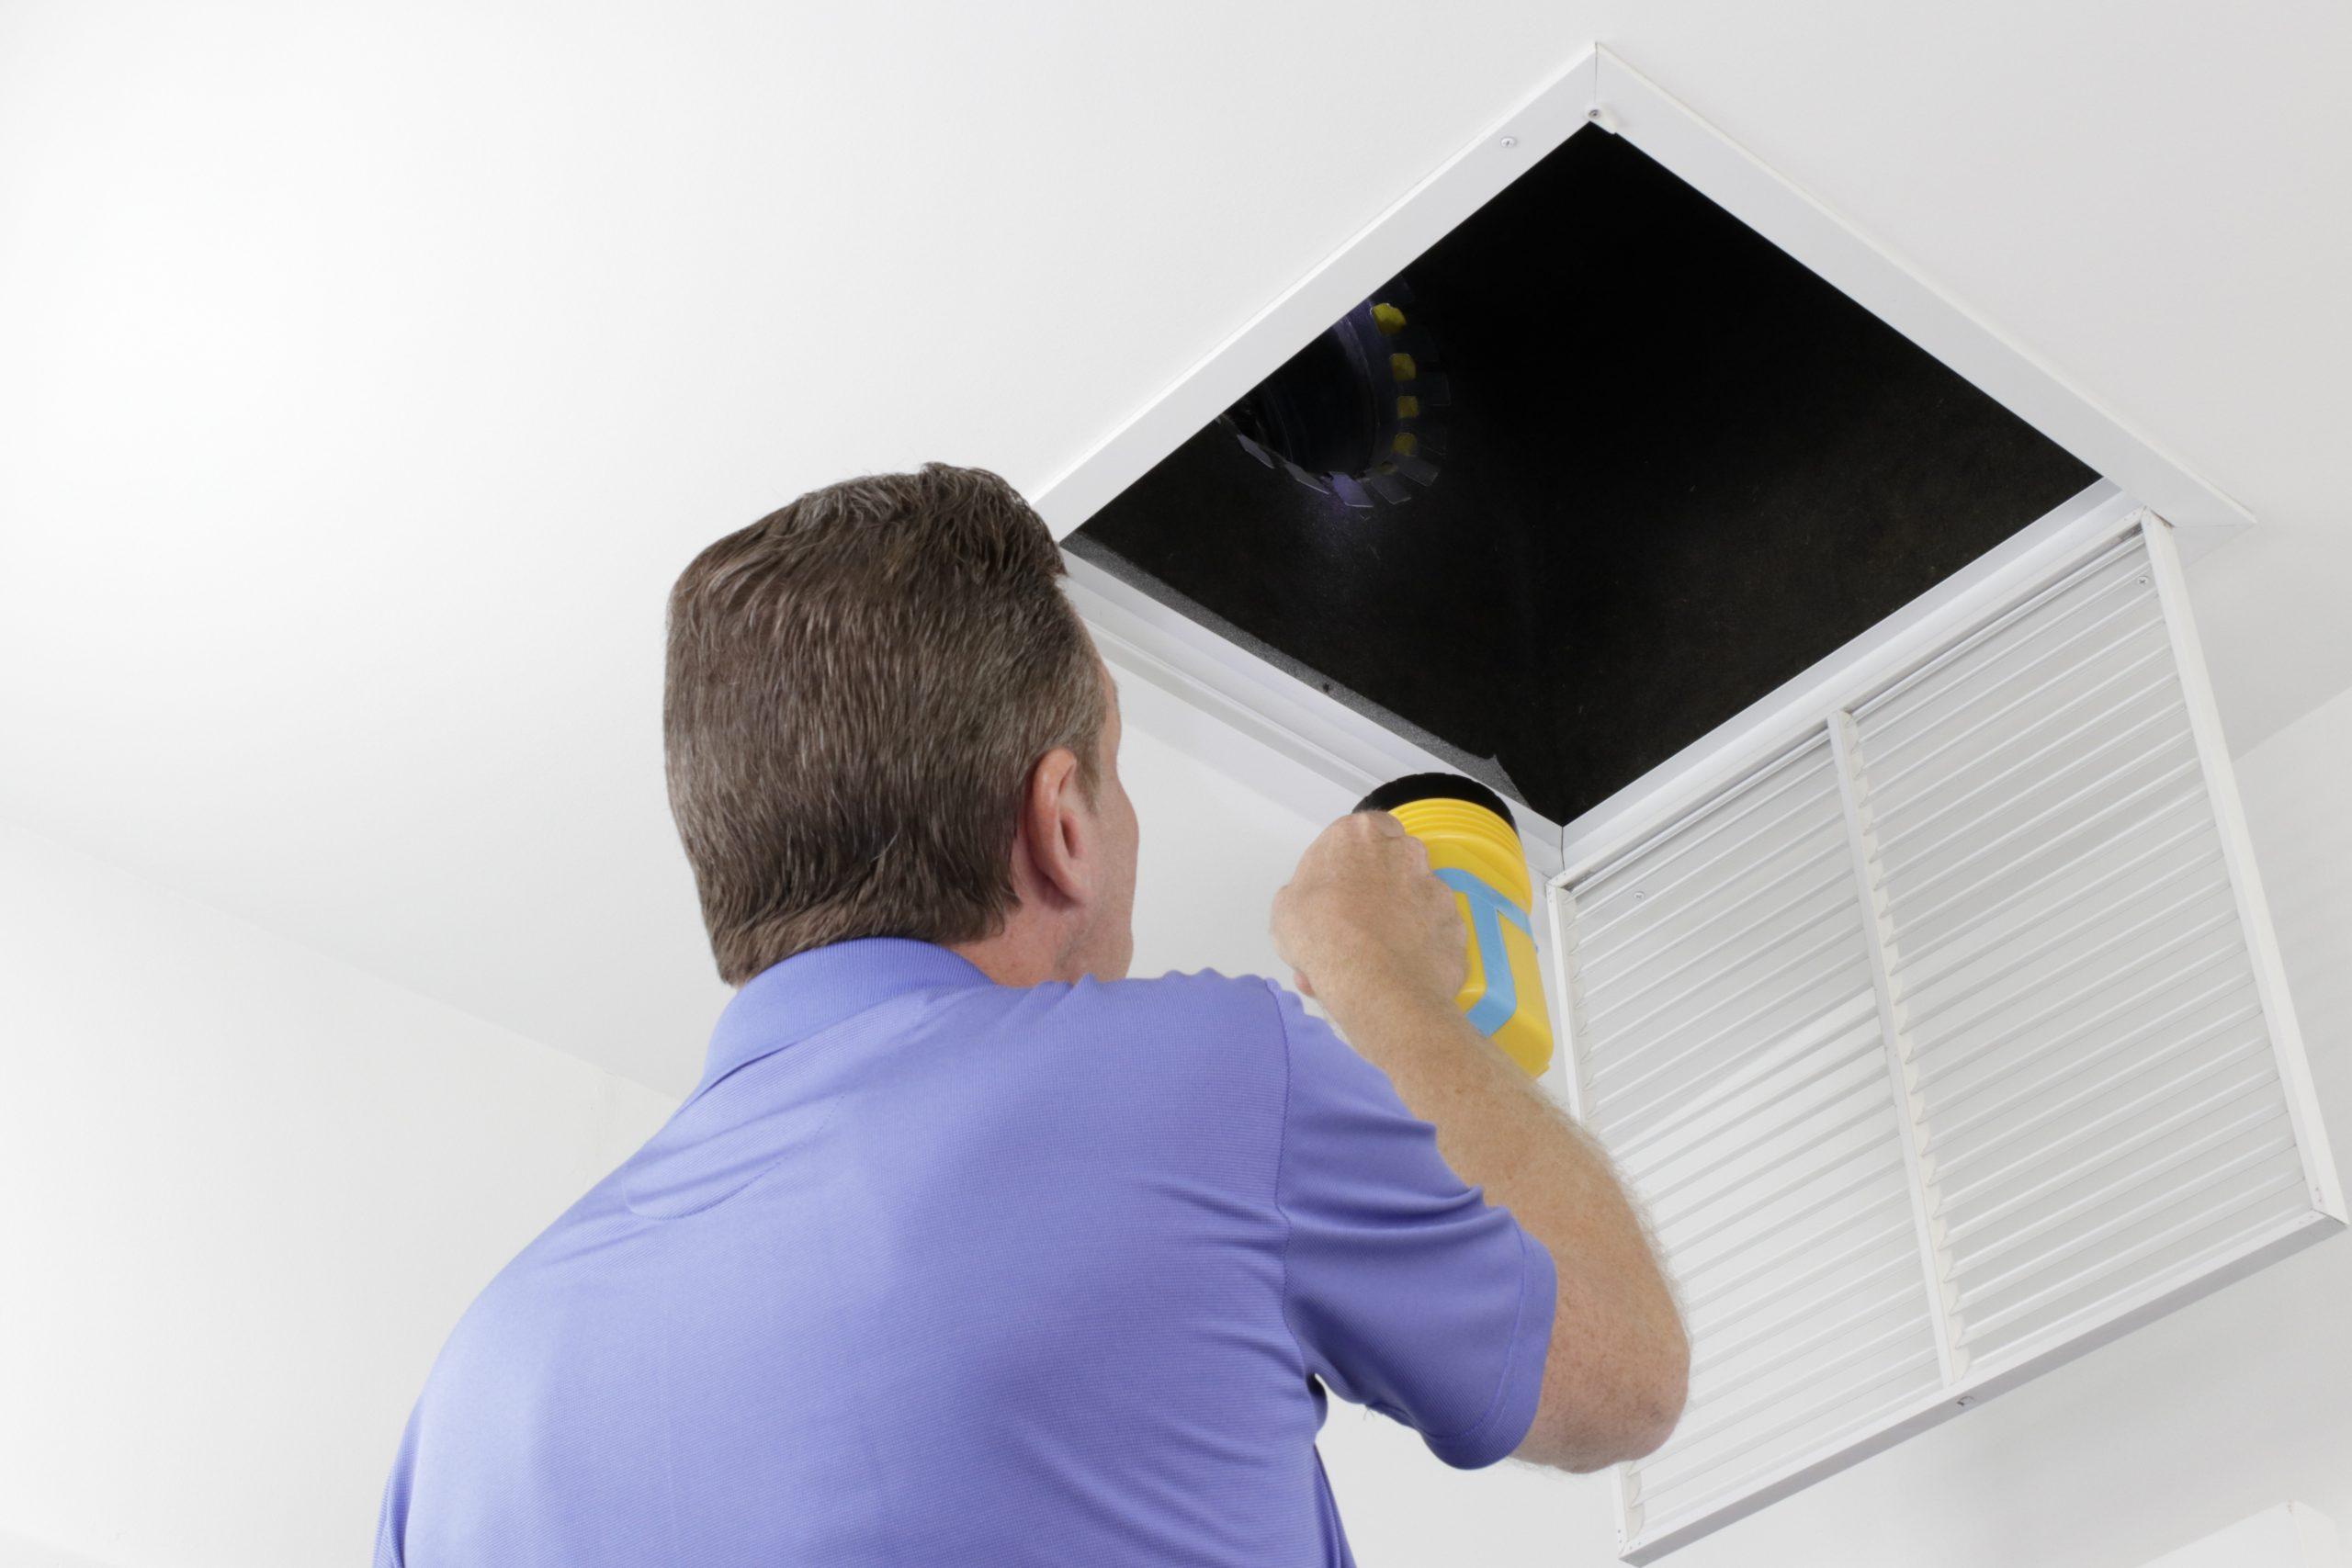 inspecting HVAC system